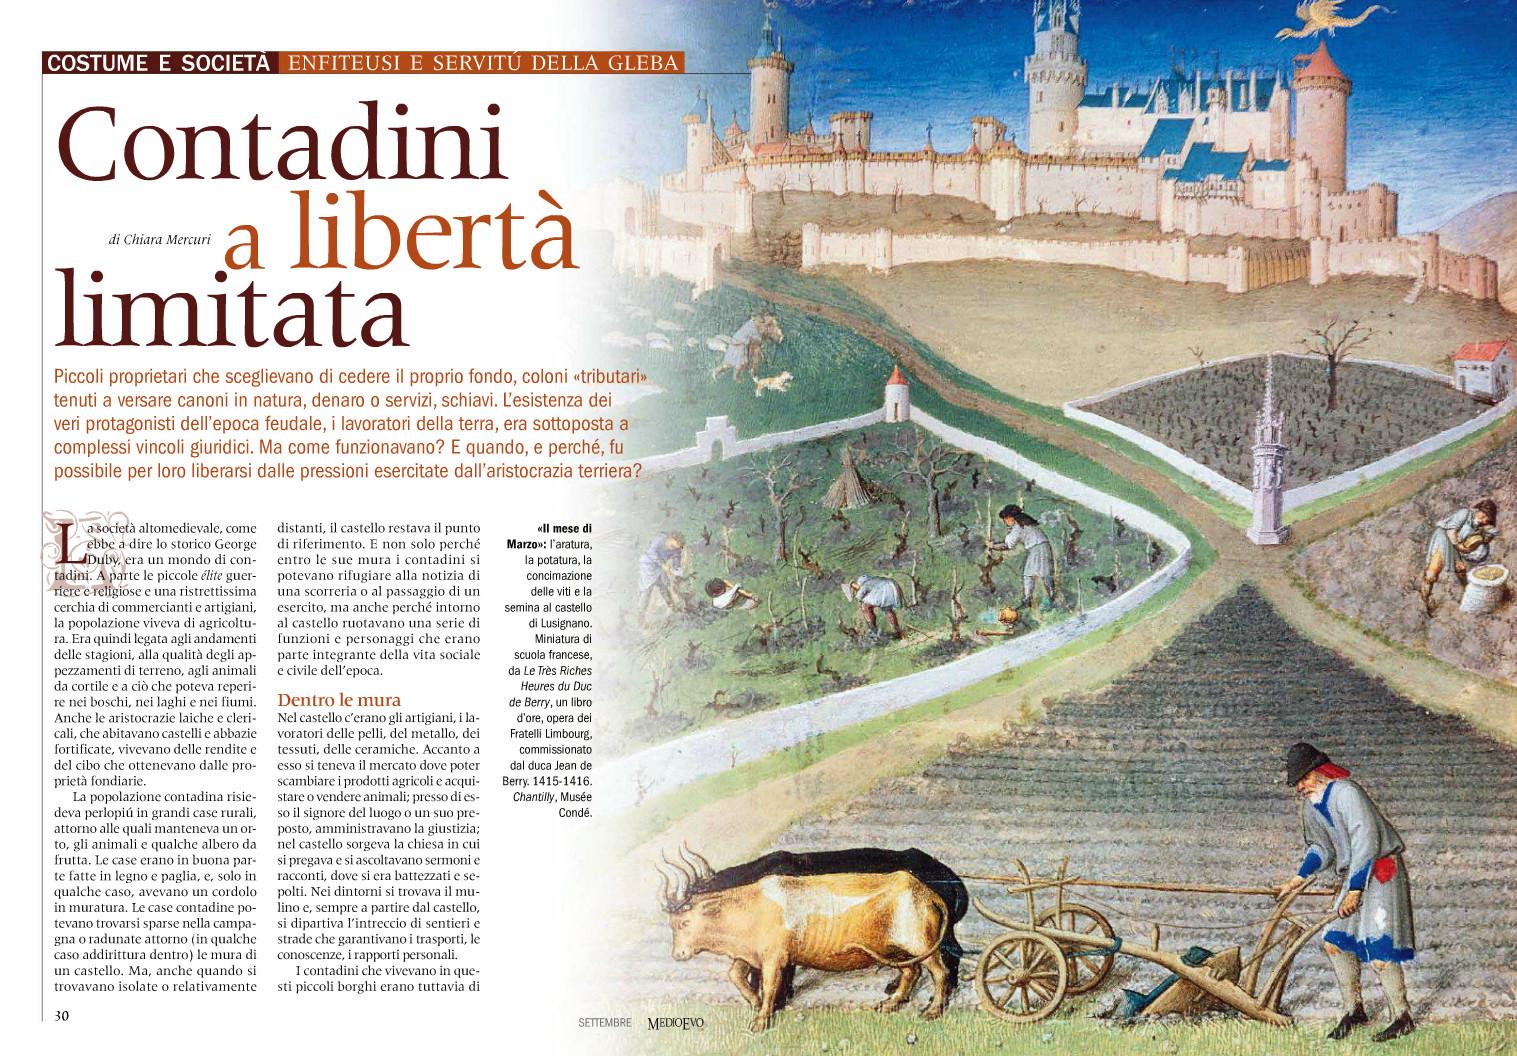 http://www.medioevouniversalis.org/images/MEDIOEVO/ENFITEUSI_E_SERVITU%27_DELLA_GLEBA_30-31_90.jpg